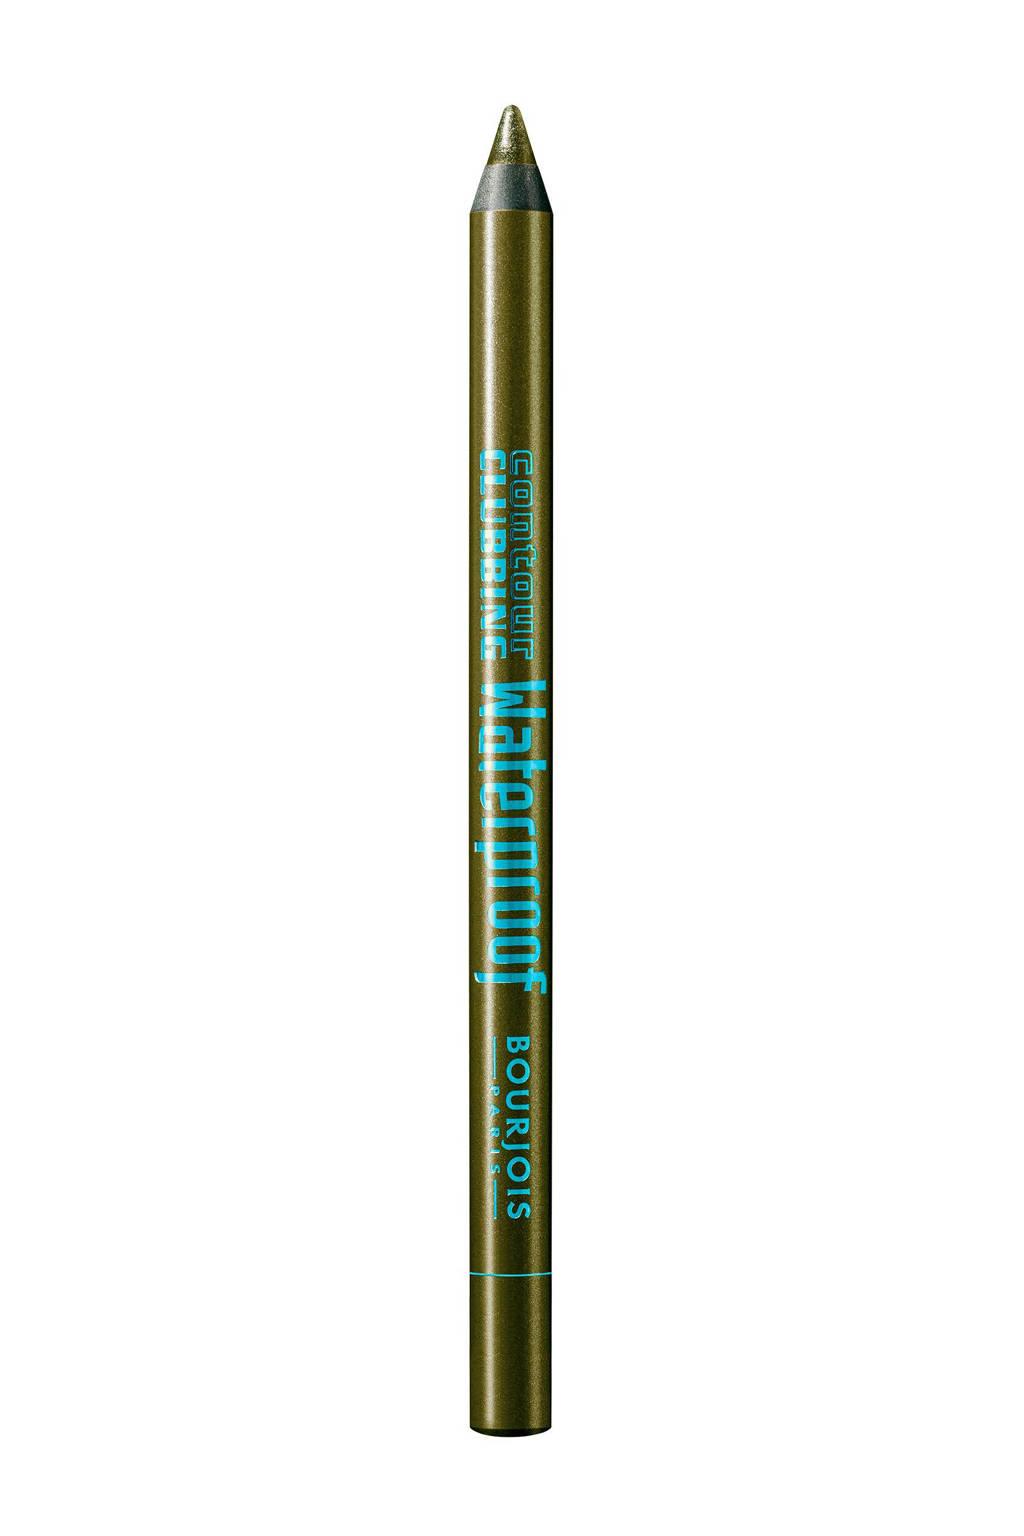 Bourjois Contour Clubbing waterproof oogpotlood - 62 So Kaki'Smatique